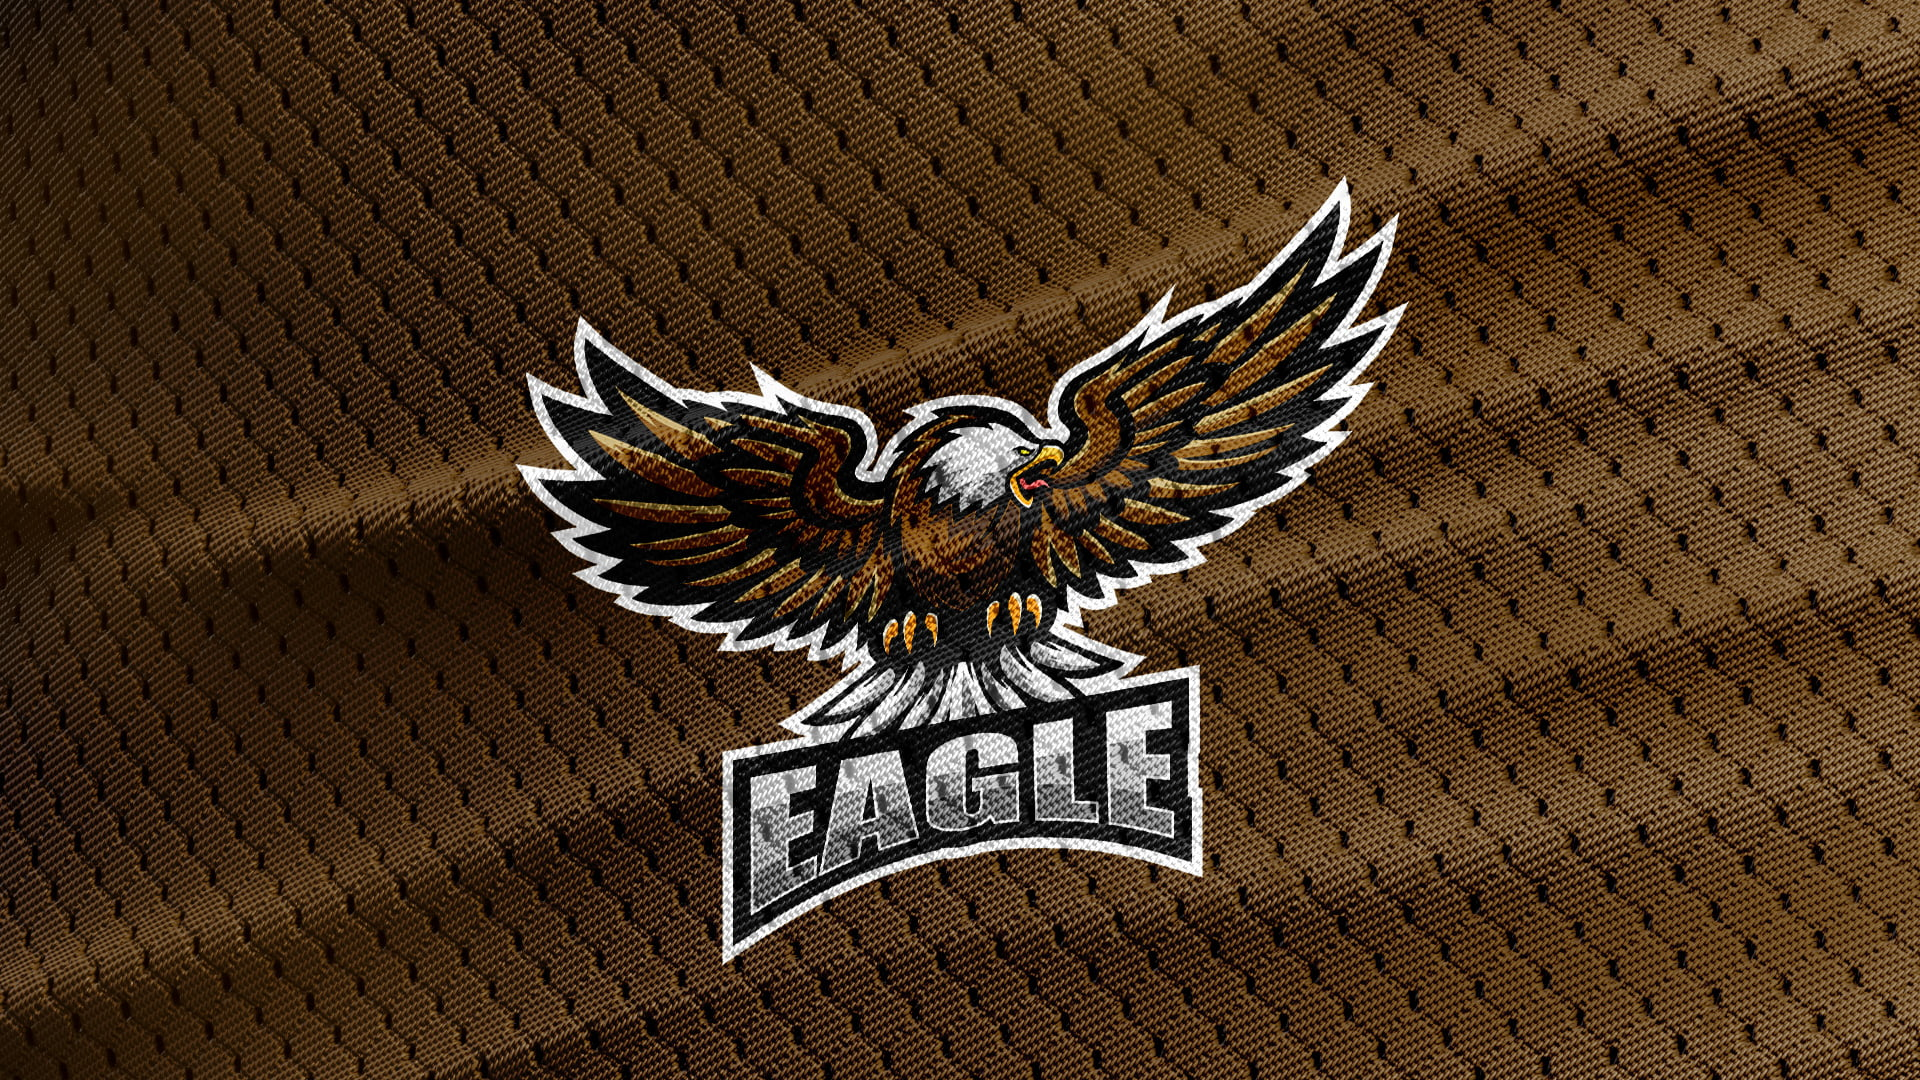 Free-Eagle-Mascot-Brown-Jersey-Texture-Logo